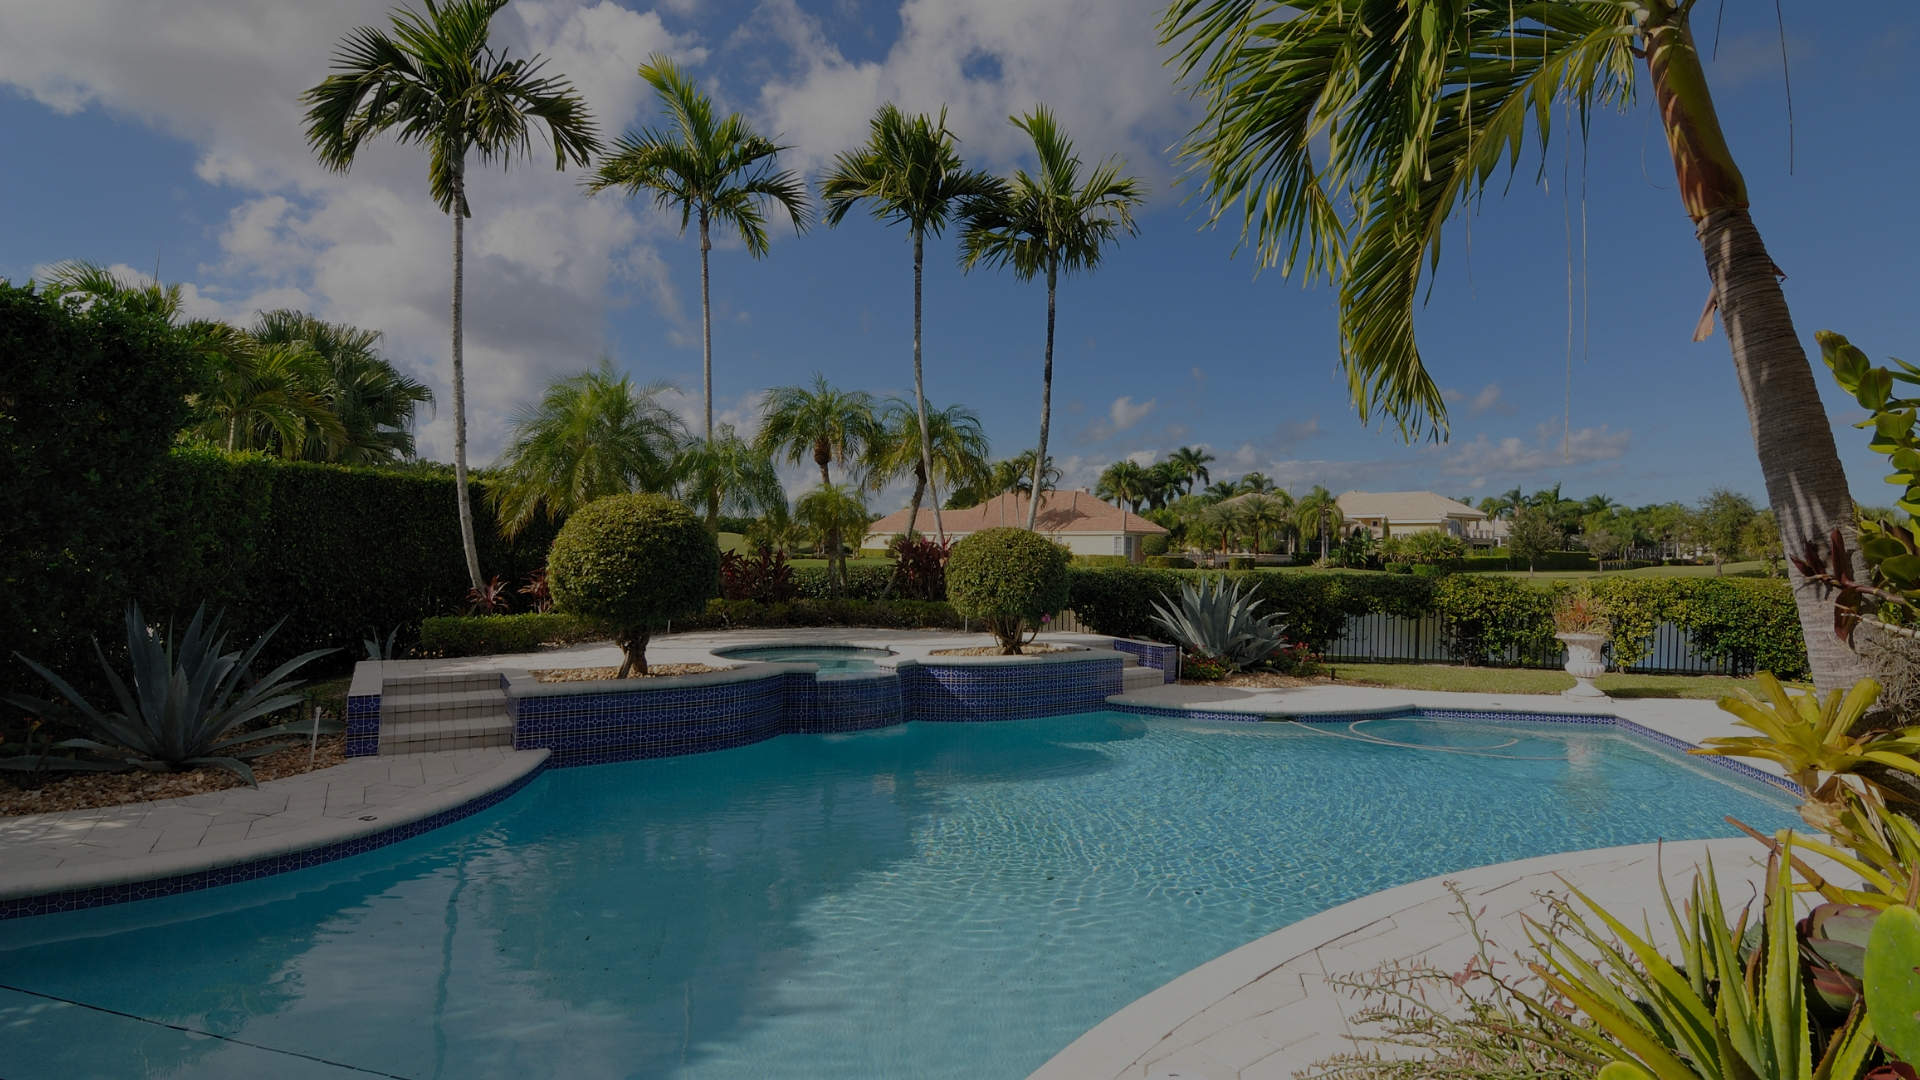 Orlando Artesian Pools